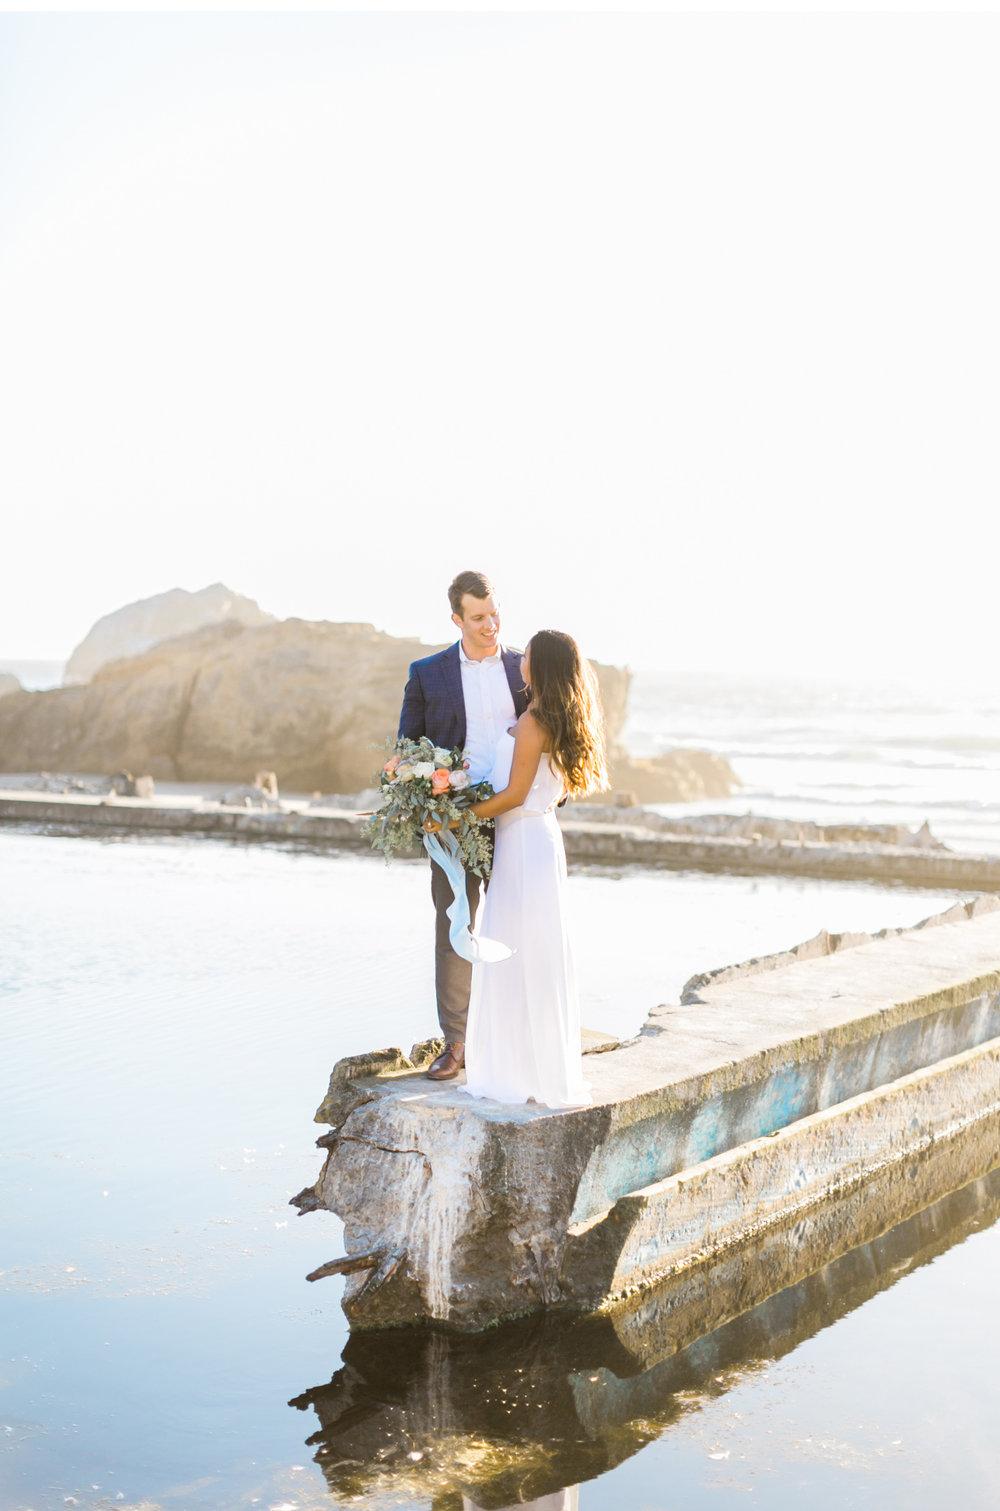 Sutro-Baths-Engagement-Natalie-Schutt-Photography-Style-Me-Pretty_06.jpg